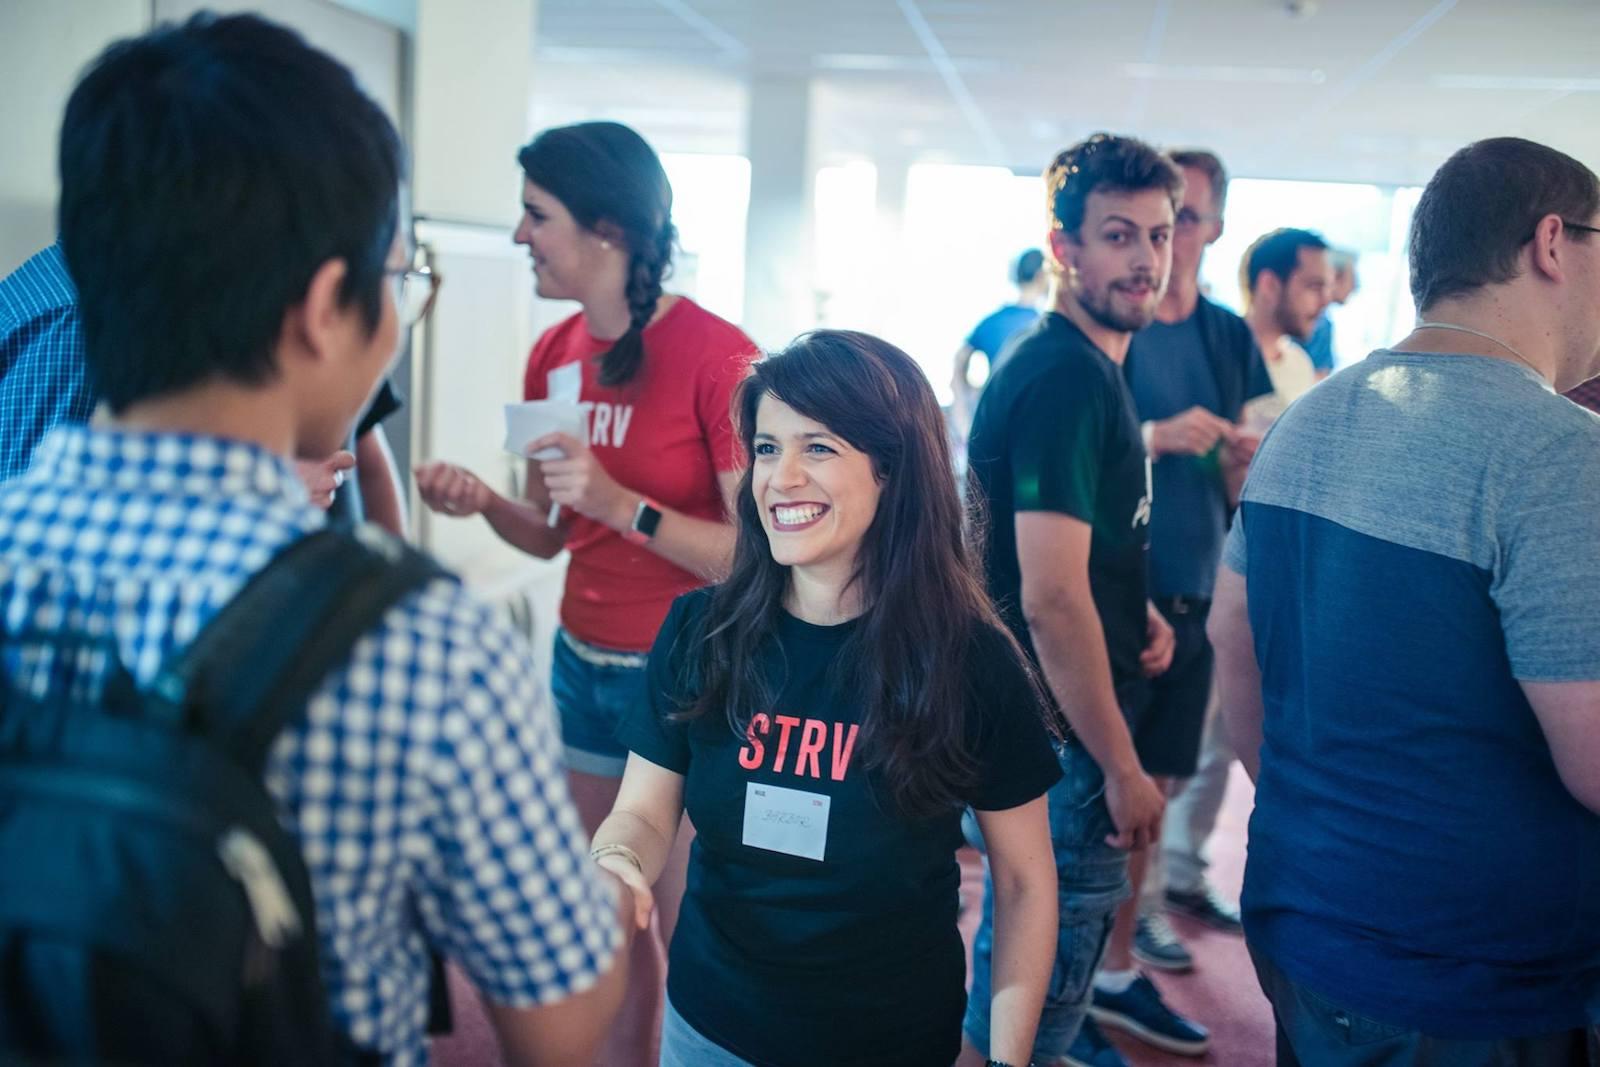 STRV Meetup